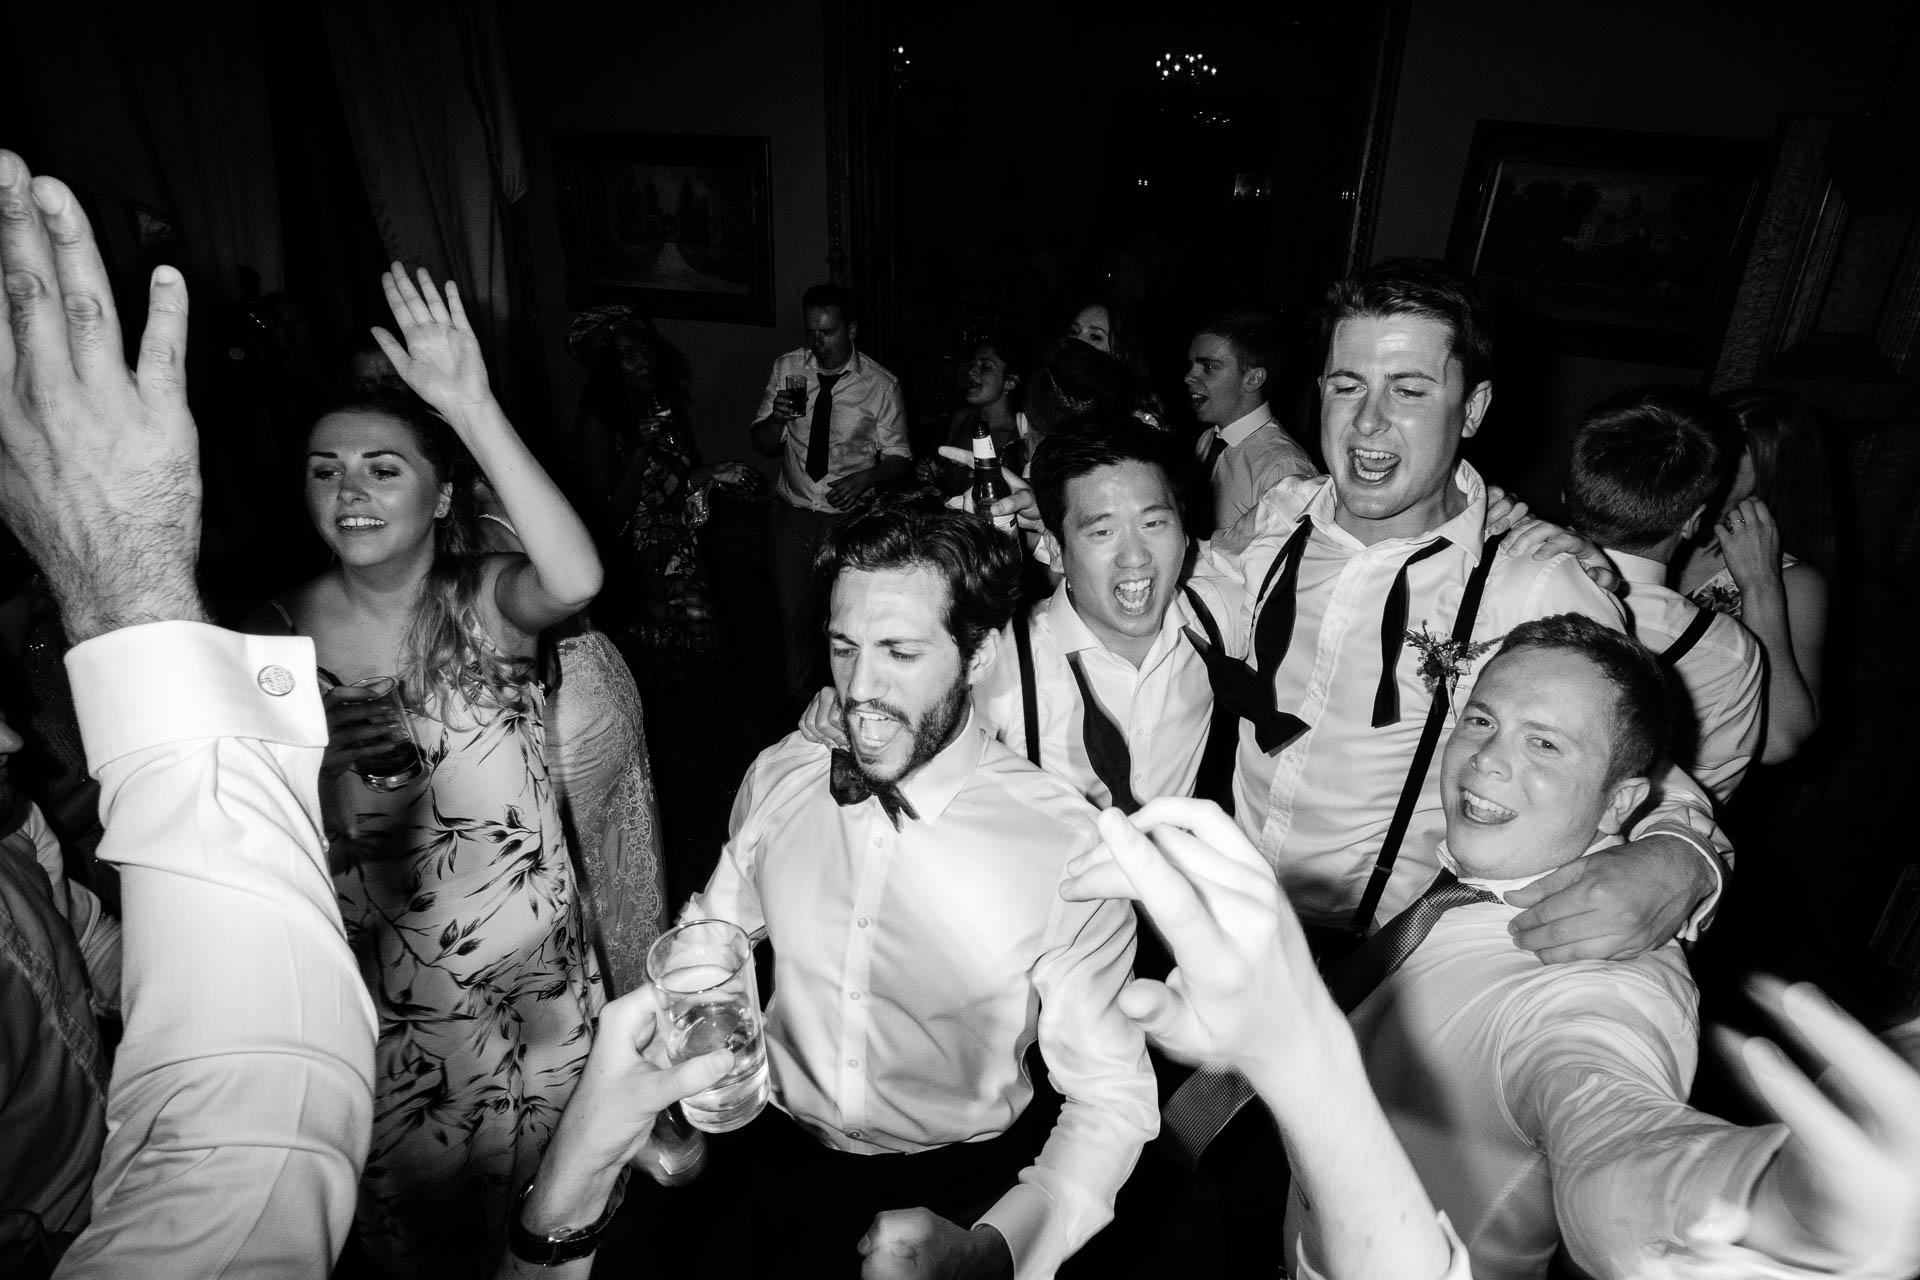 orchardleigh house wedding - Danni & Barney (554).jpg